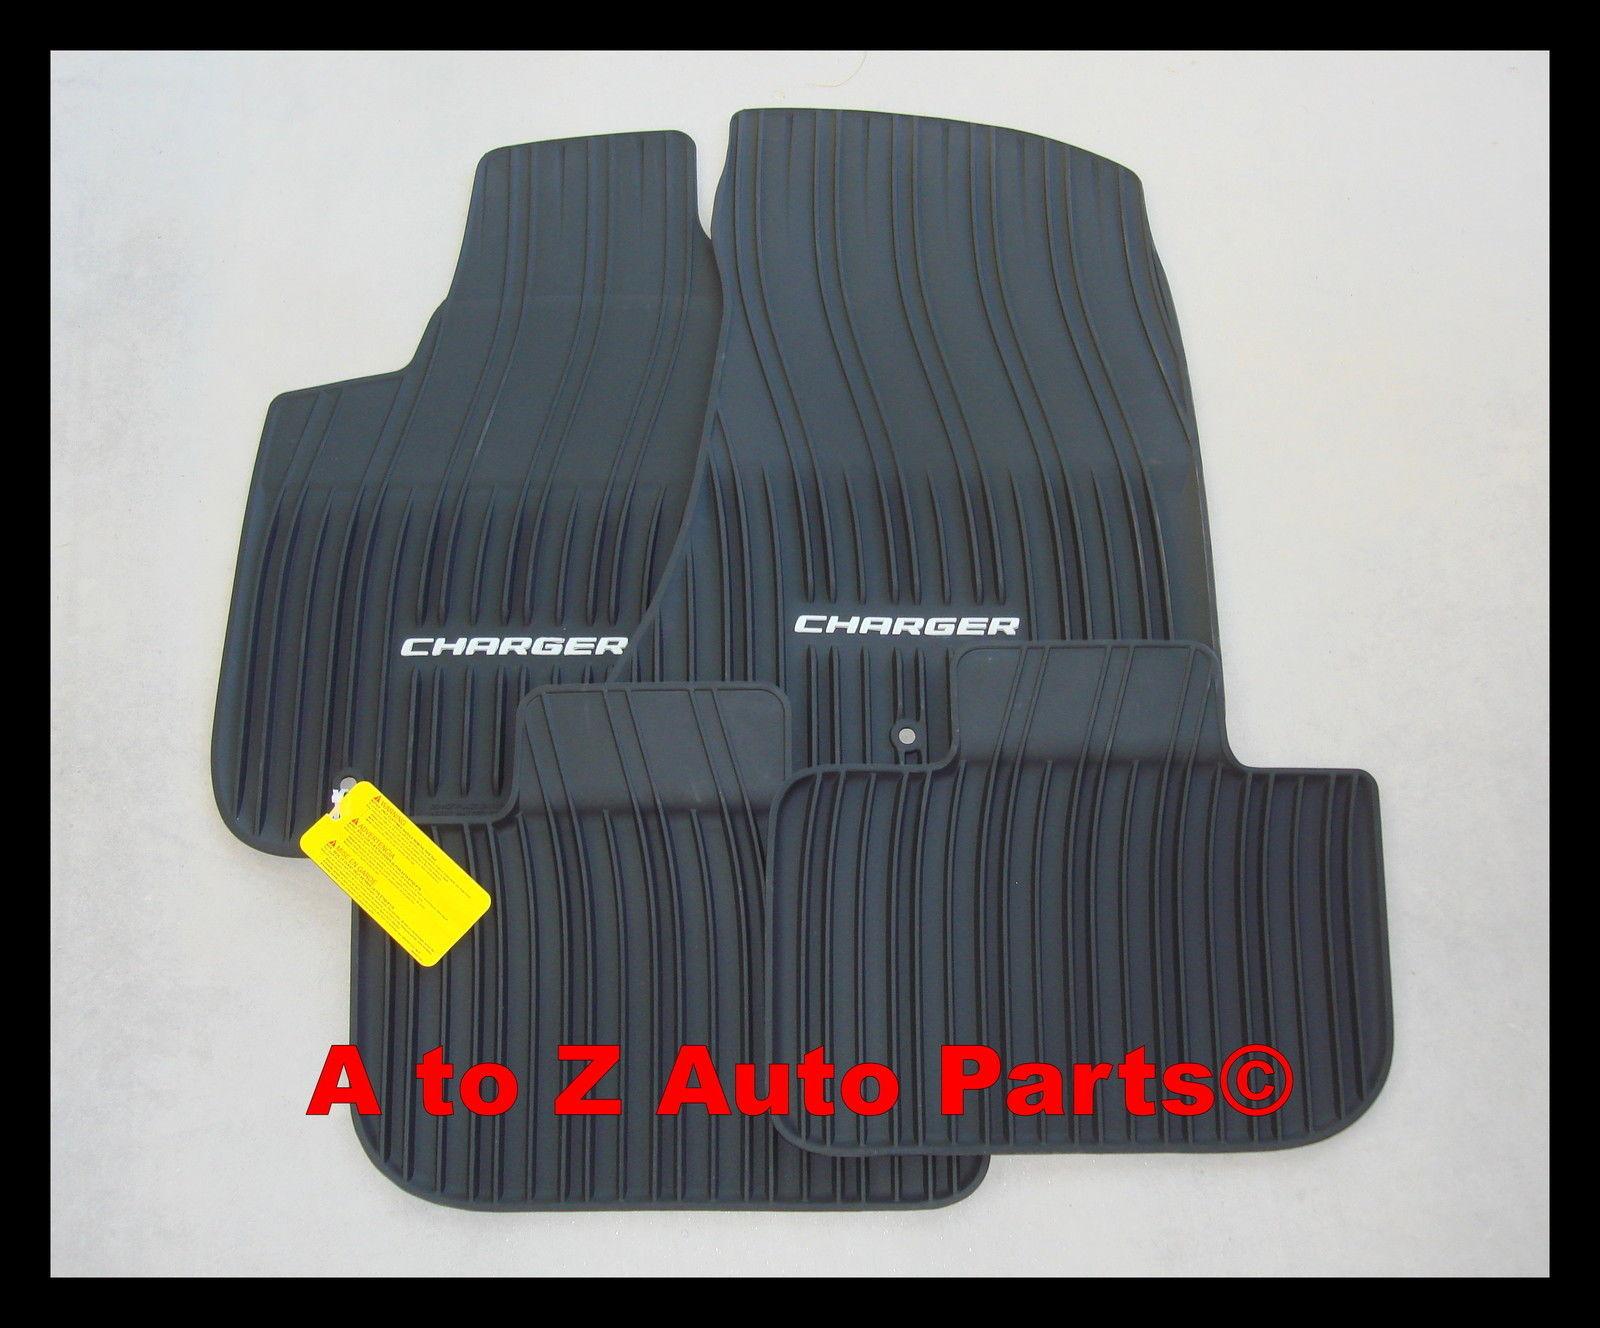 NEW 2011-2014 Dodge Charger RUBBER Slush Style Floor Mats, OEM Mopar - $104.95